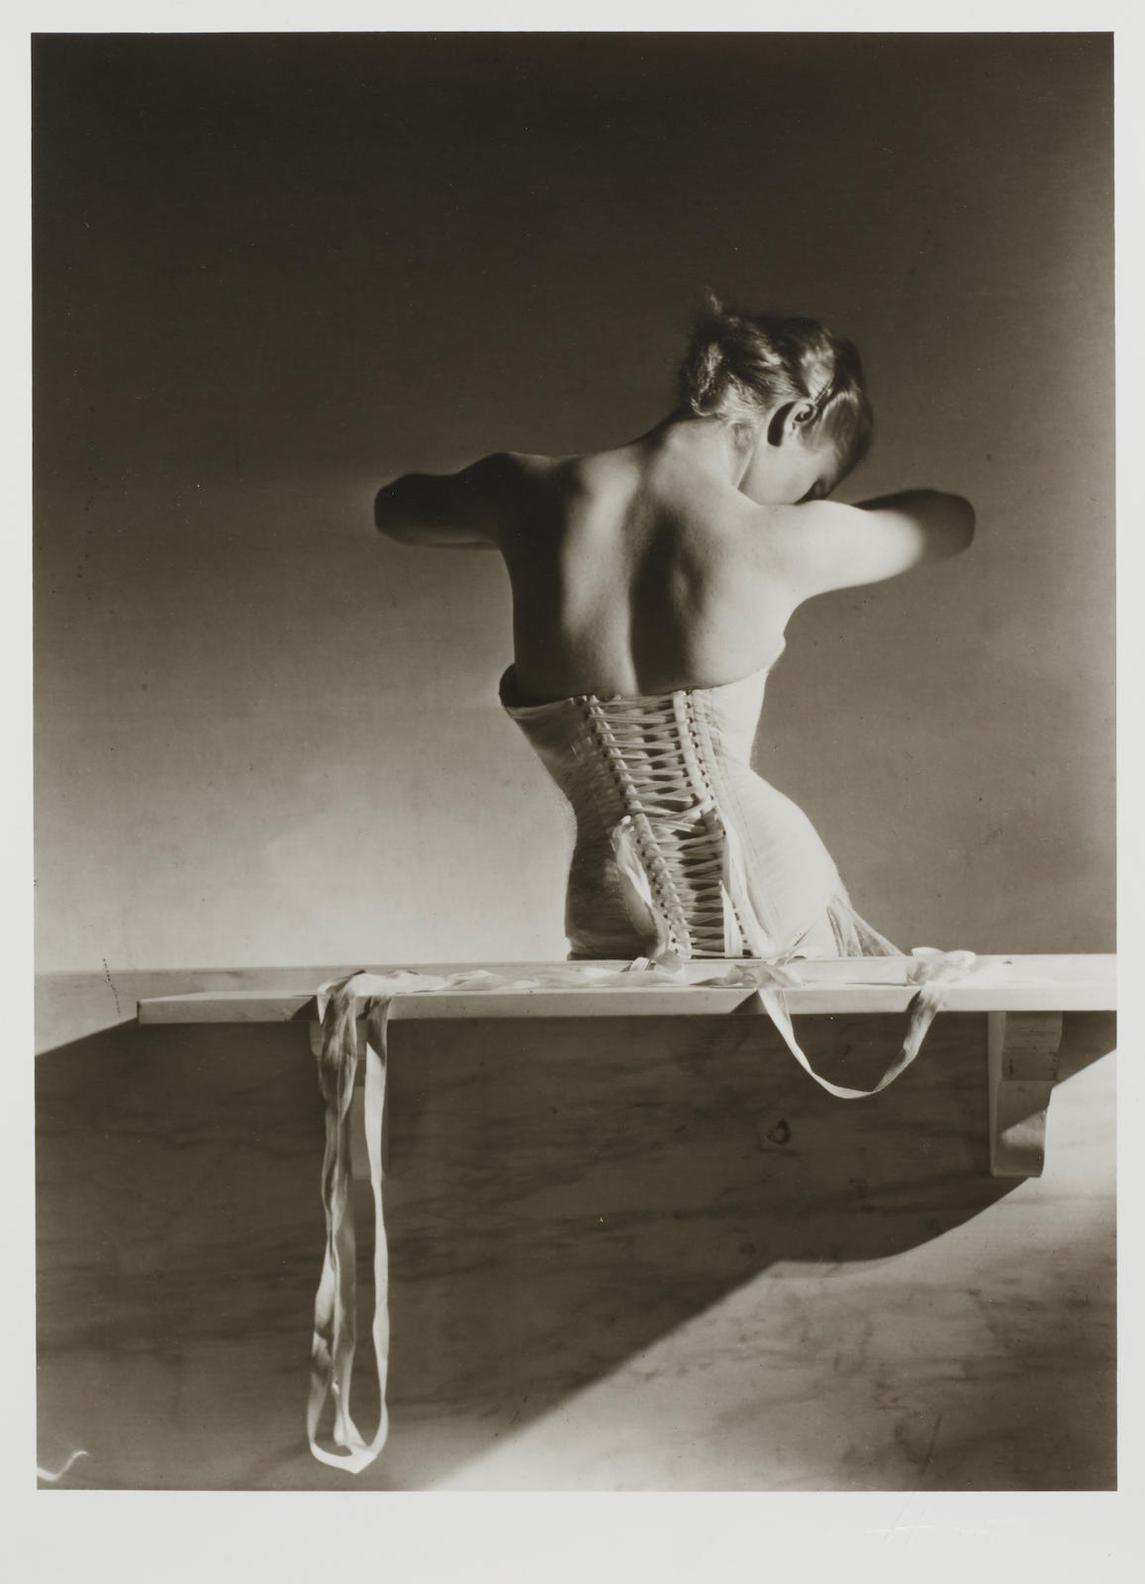 Horst P. Horst-Mainbocher Corset For French Vogue-1939